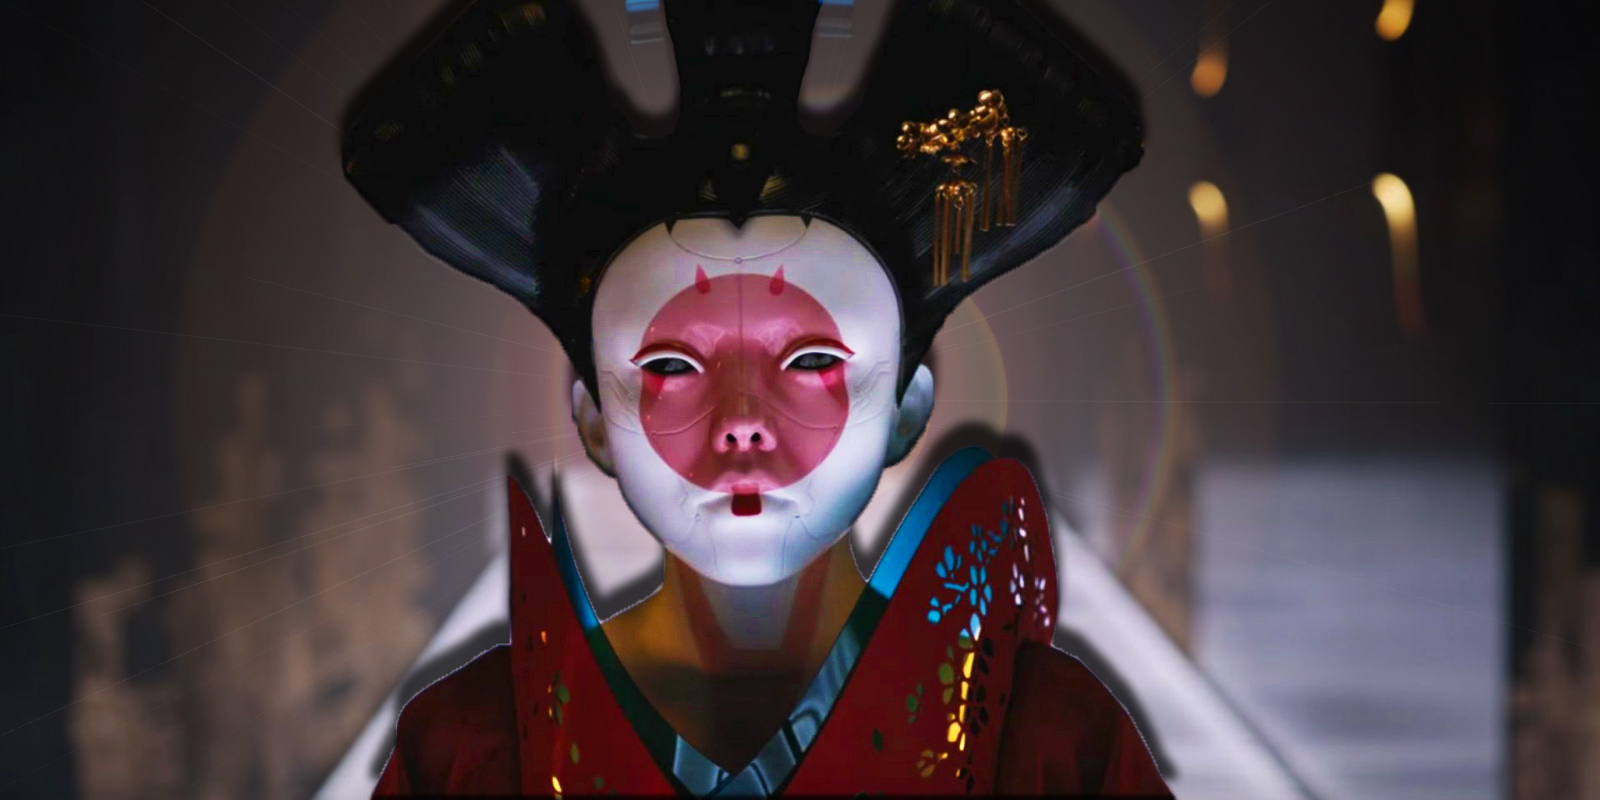 Motoko kusanagi ghost in the shell vs kasumi dead or alive 5 8